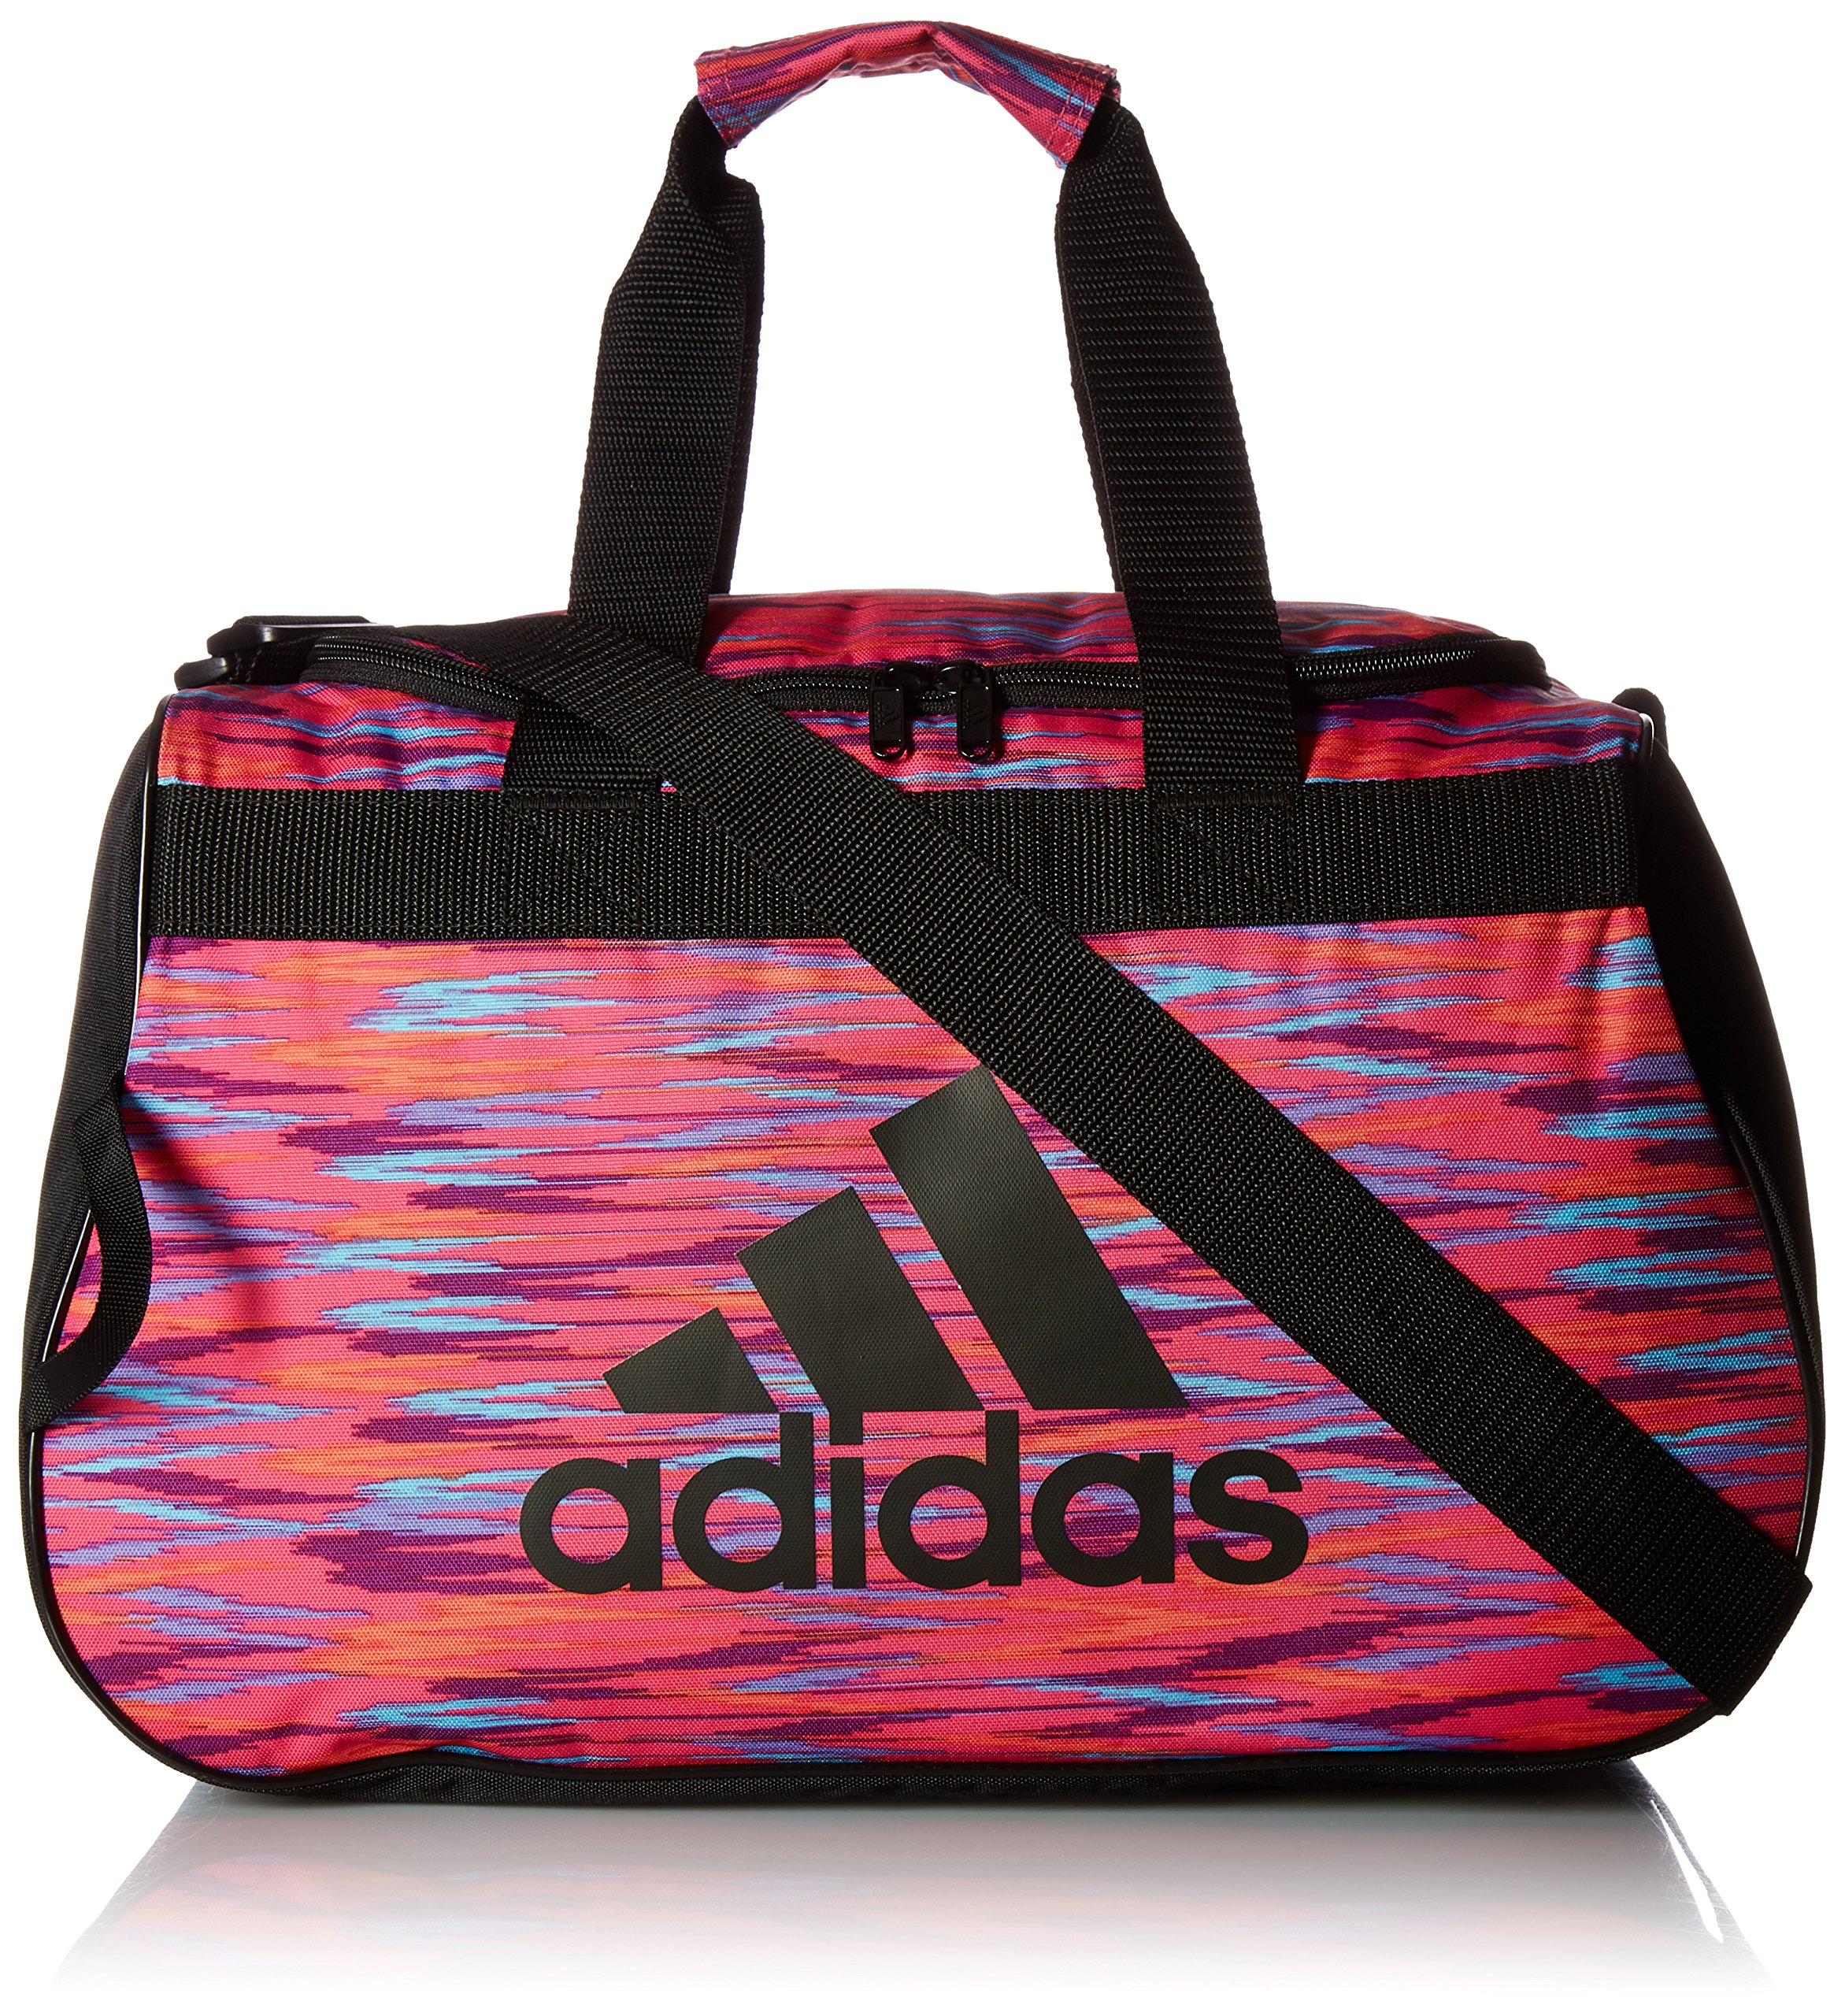 adidas Diablo Small Duffel Bag, Shock Pink Twister/Black/Shock Pink, One Size